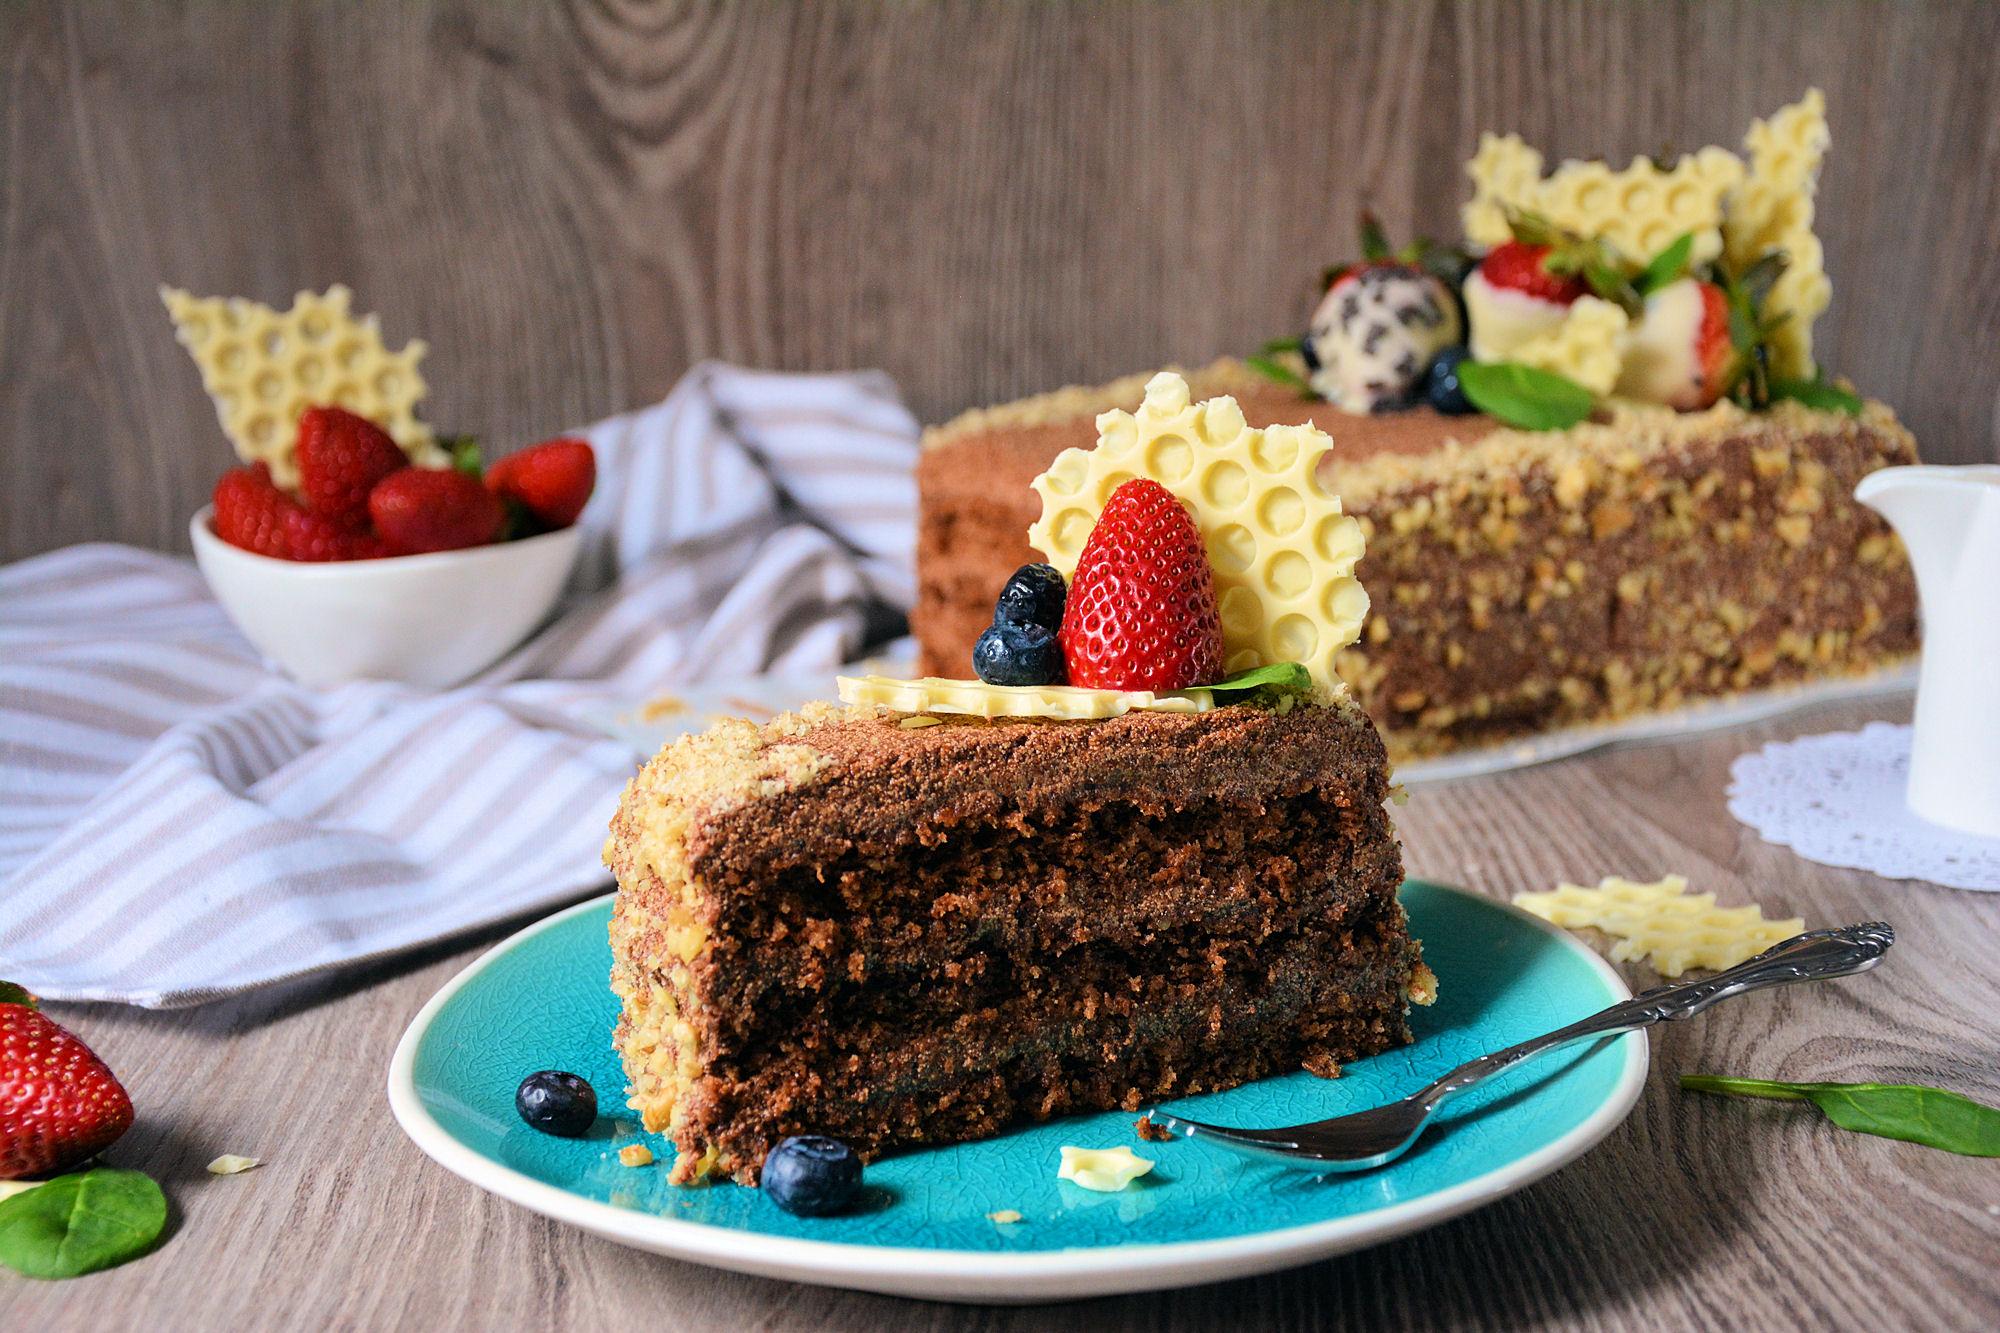 Posna Reform torta (video)